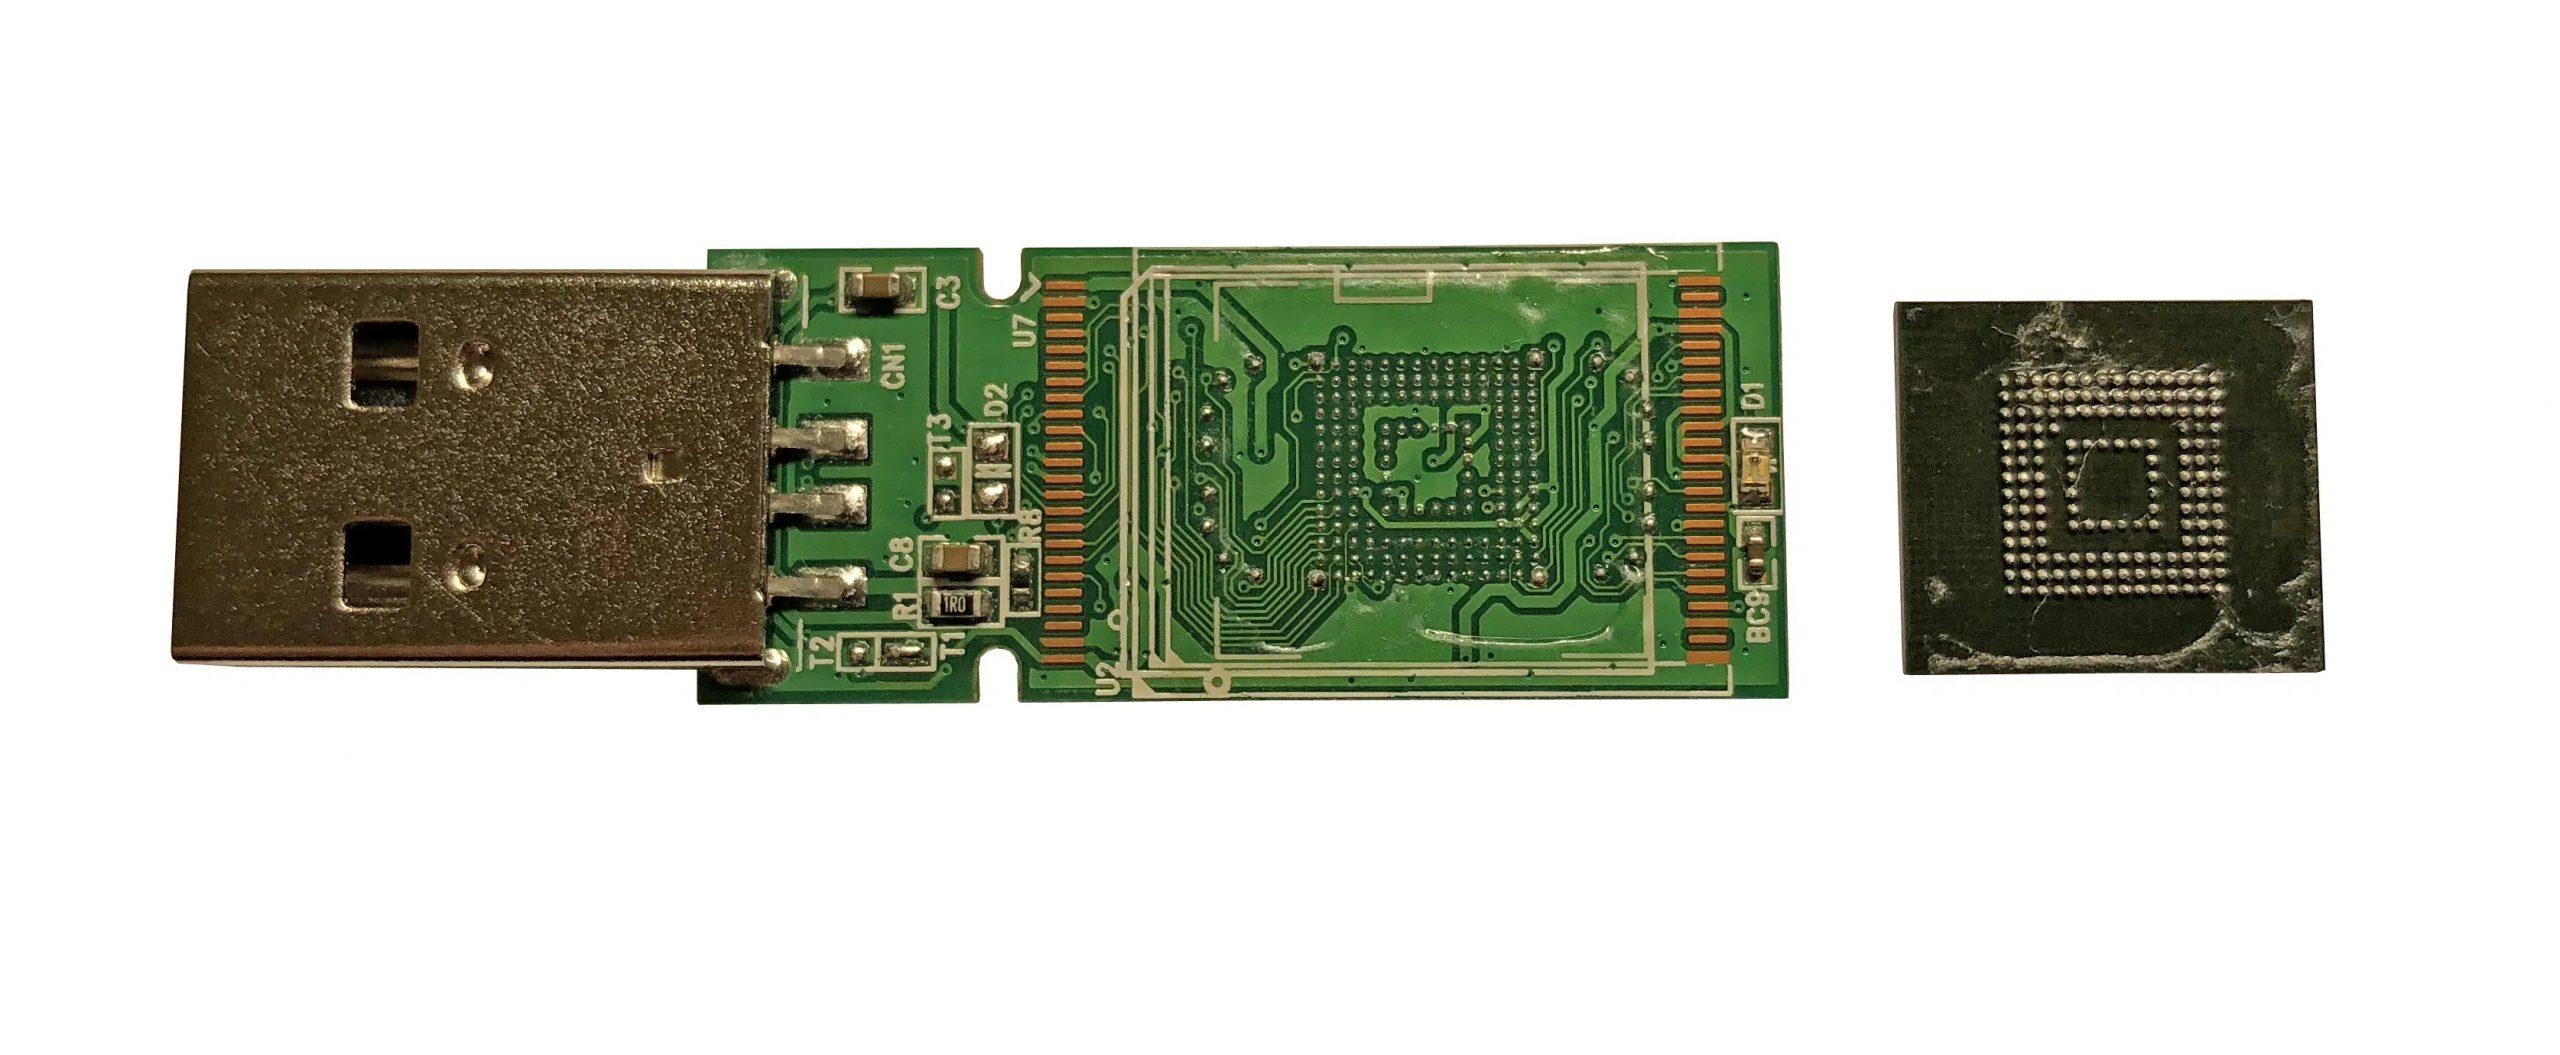 PC-3000 Flash如何将COB(黑牛屎芯片)的存储芯片从NAND闪存驱动器中恢复数据